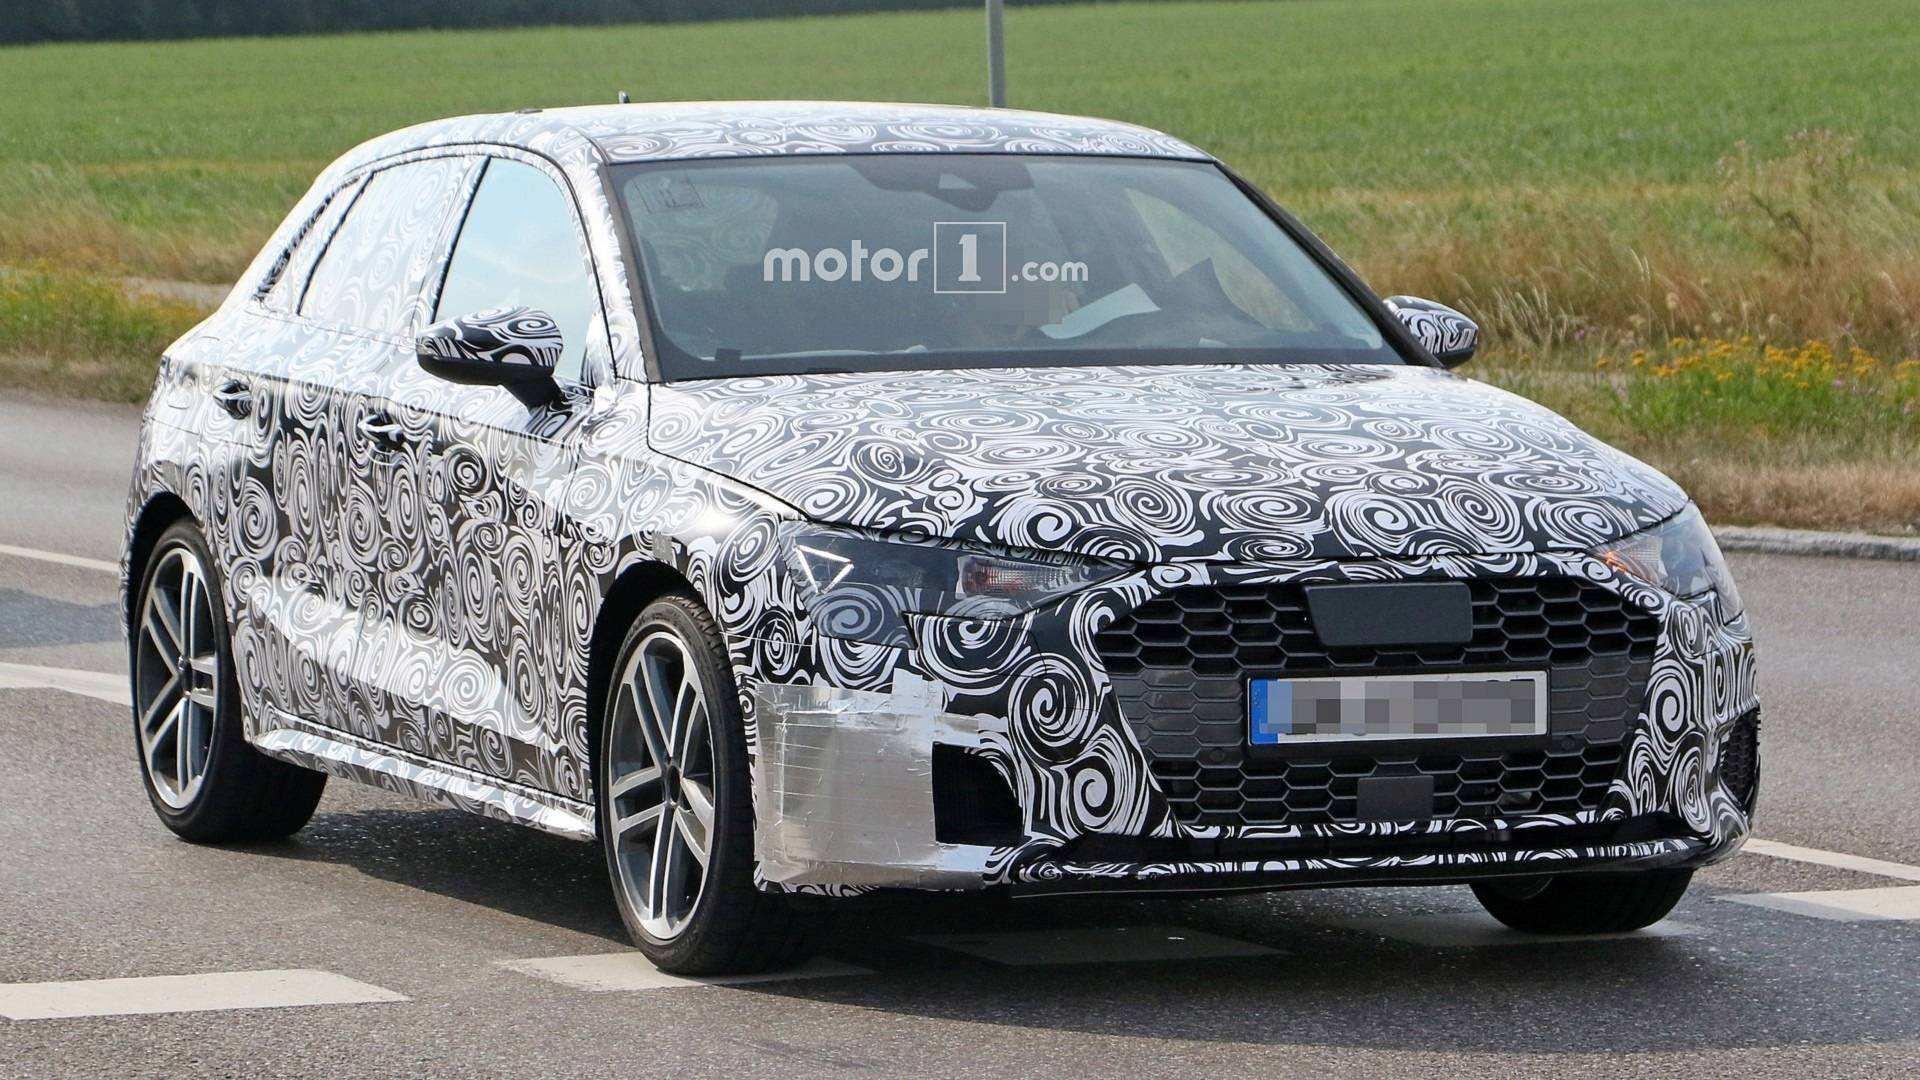 81 Great Audi A3 Hatchback 2020 Redesign by Audi A3 Hatchback 2020